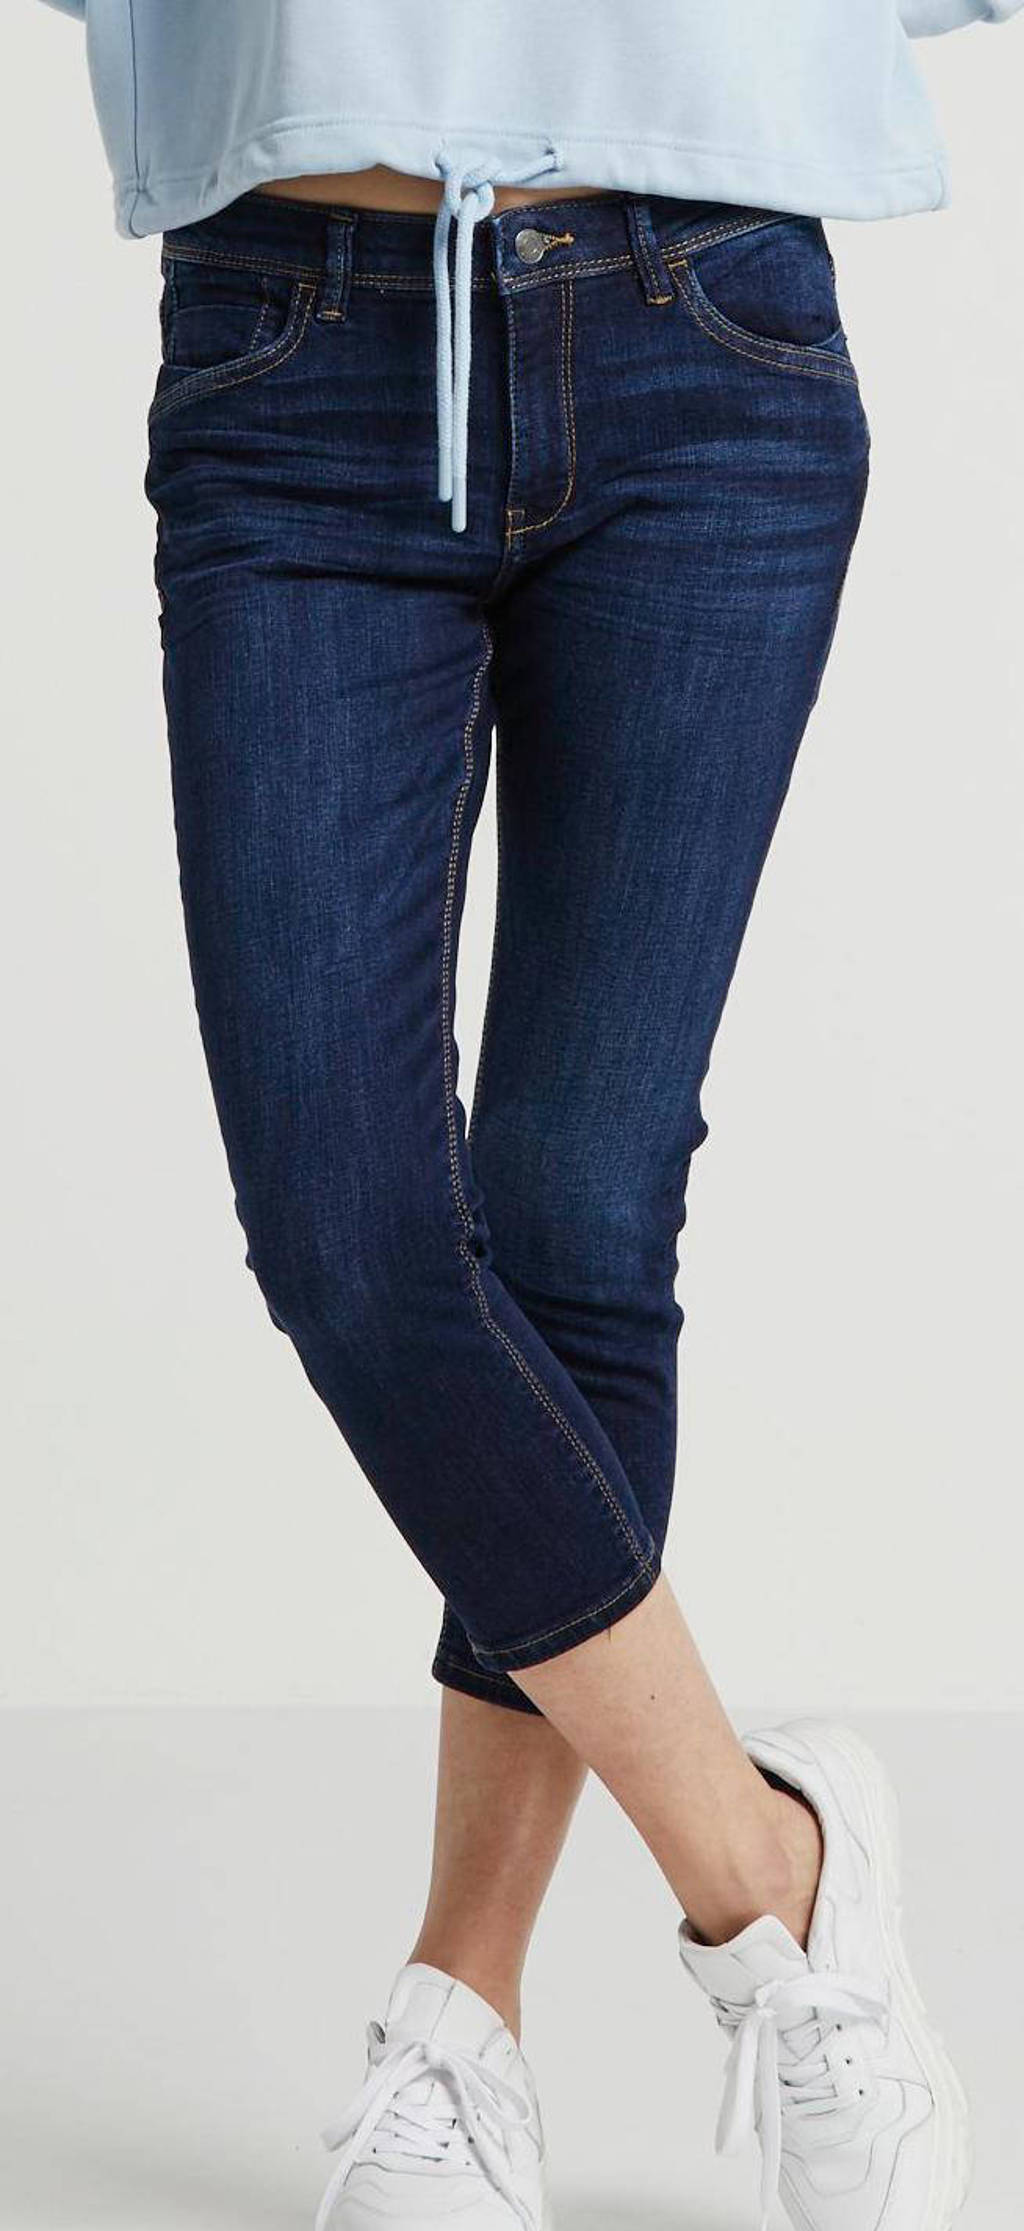 ESPRIT Women Casual cropped skinny jeans blauw met splitje, Blauw